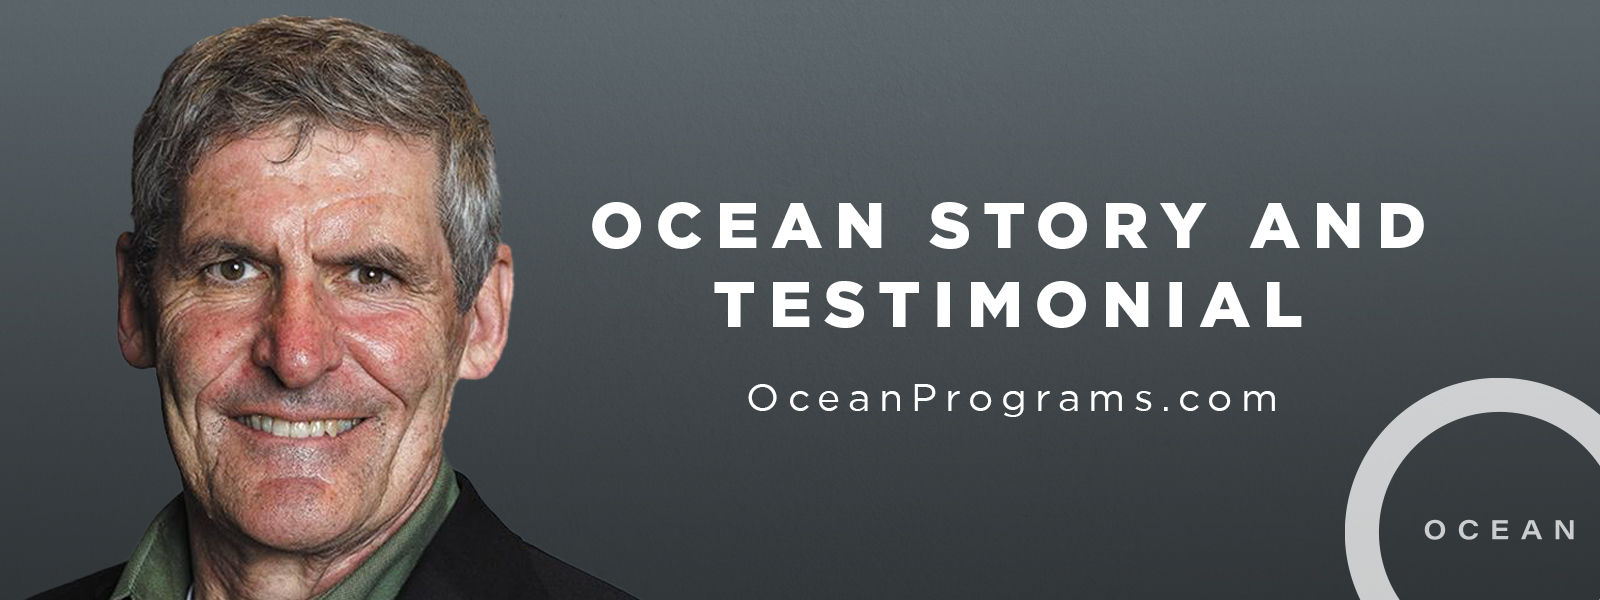 OCEAN Story and Testimonial